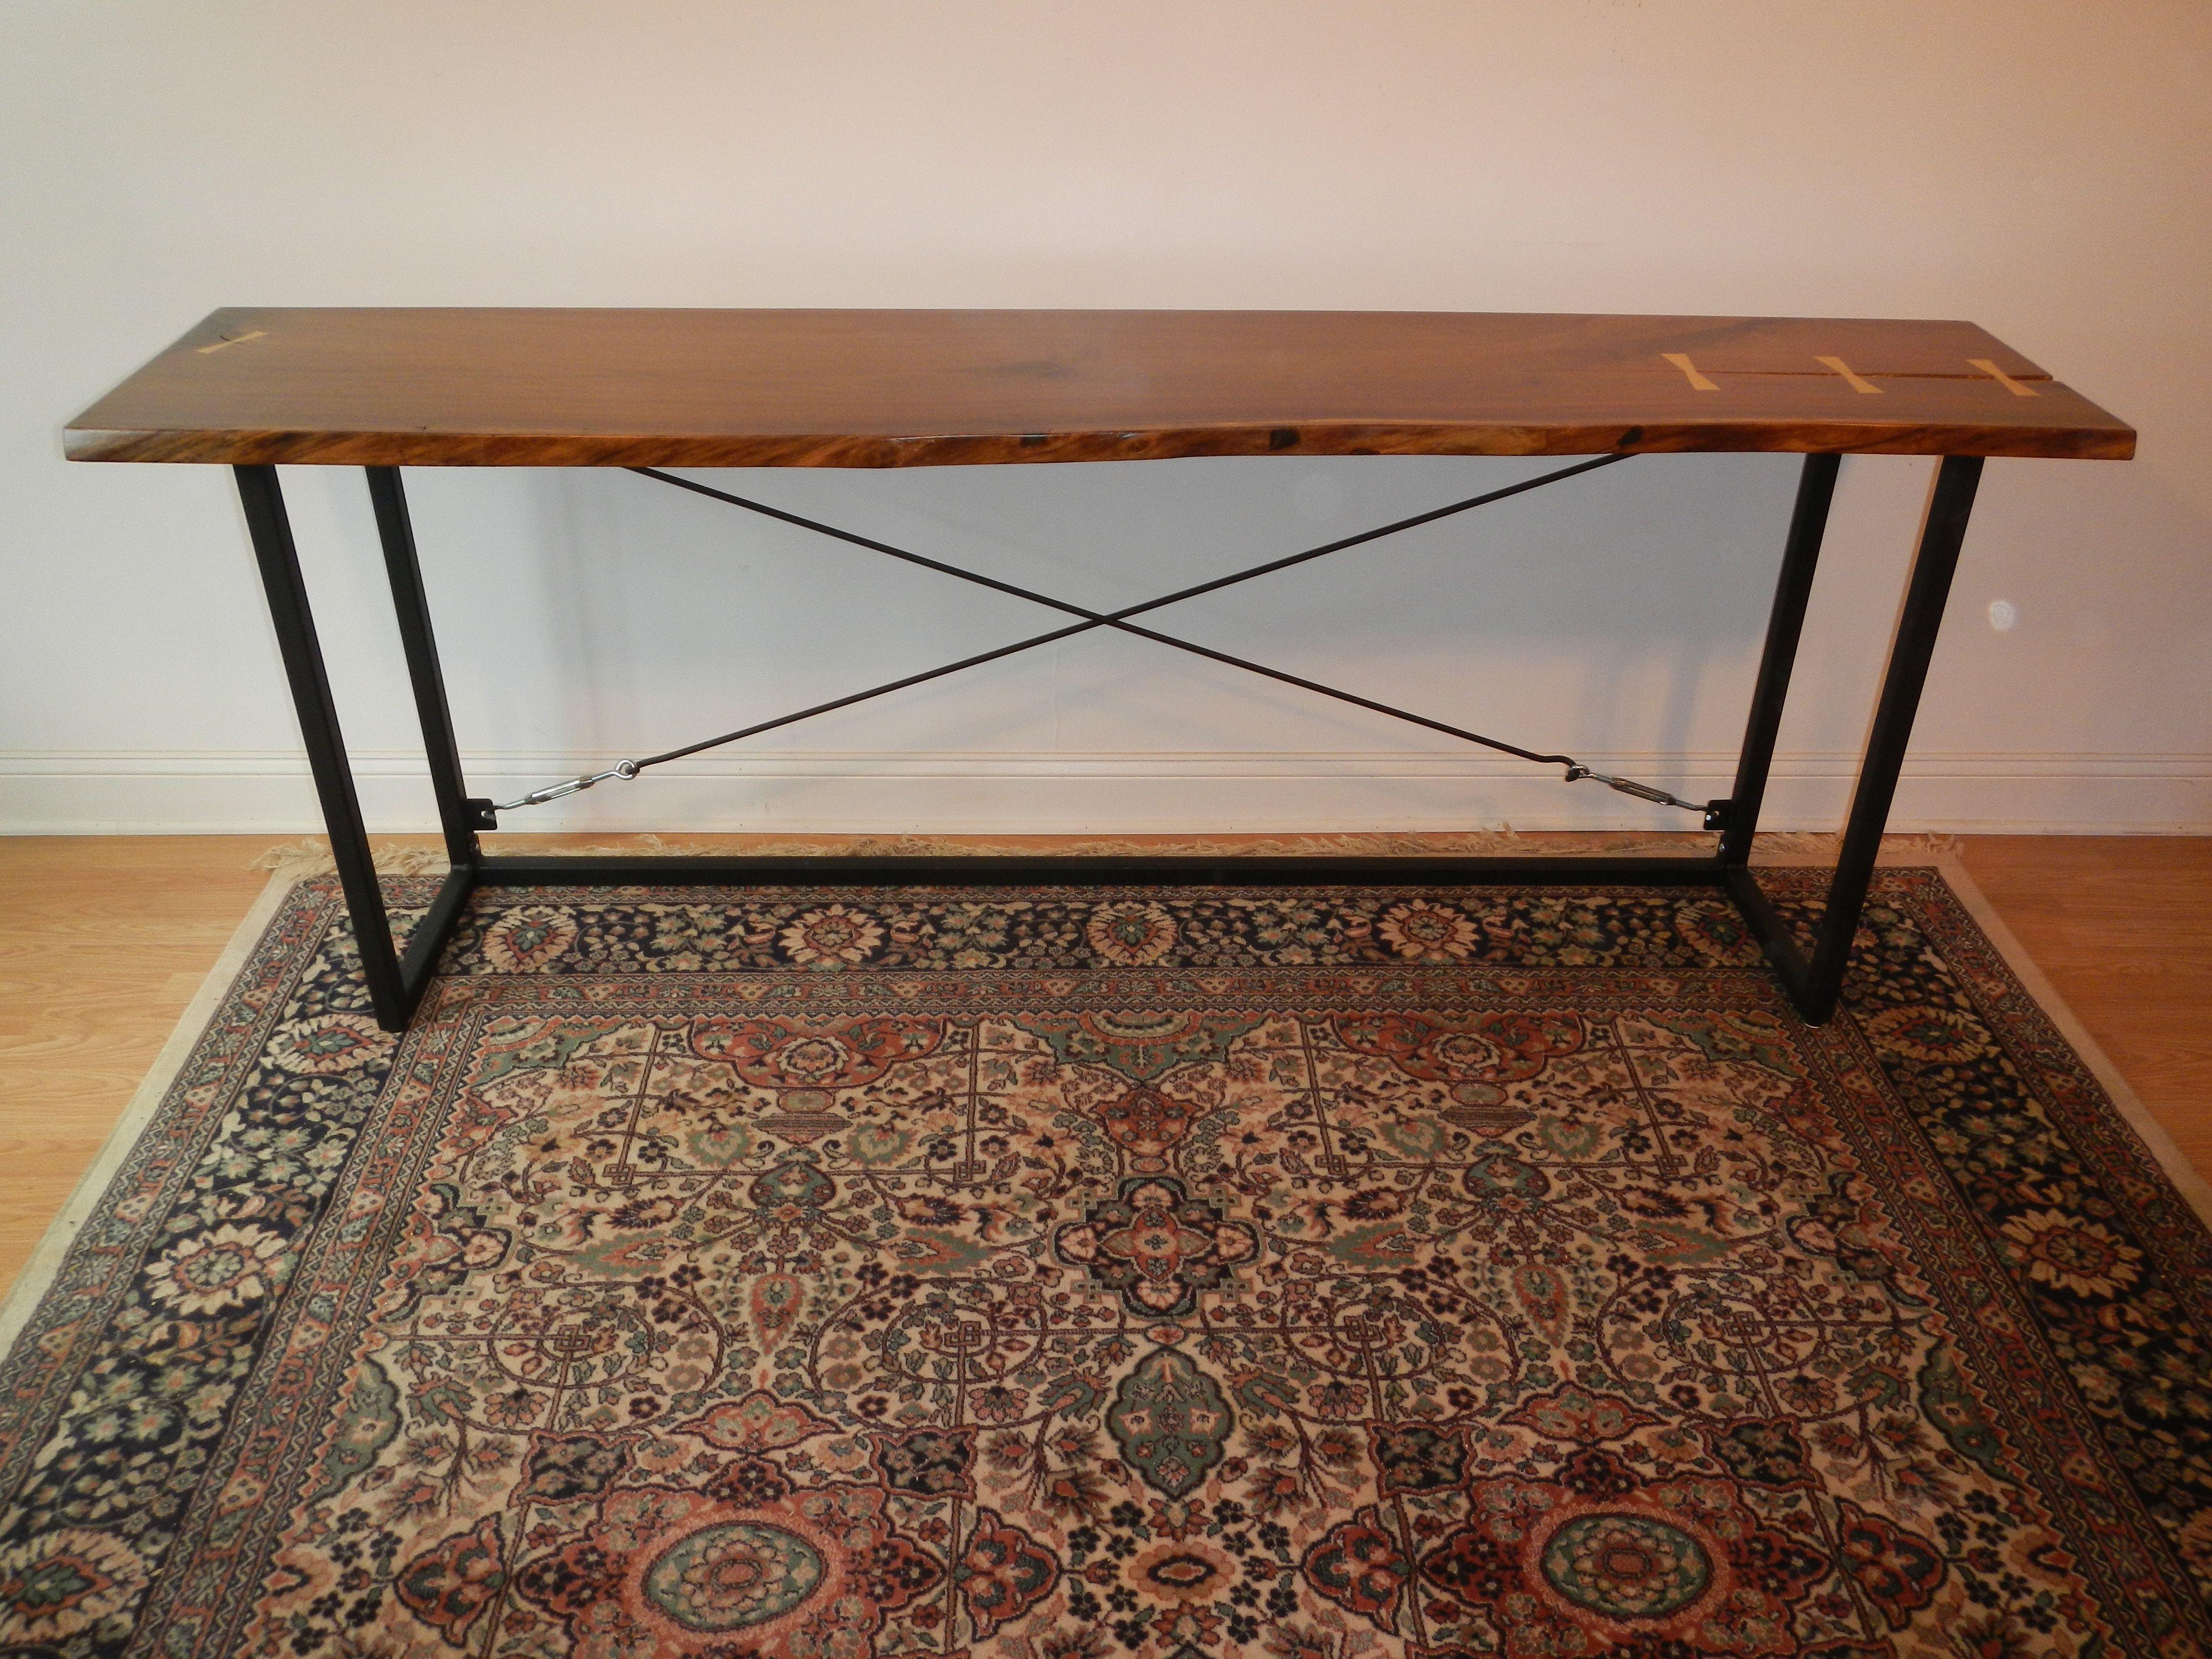 Strange Live Edge Black Walnut Console Table Ibusinesslaw Wood Chair Design Ideas Ibusinesslaworg